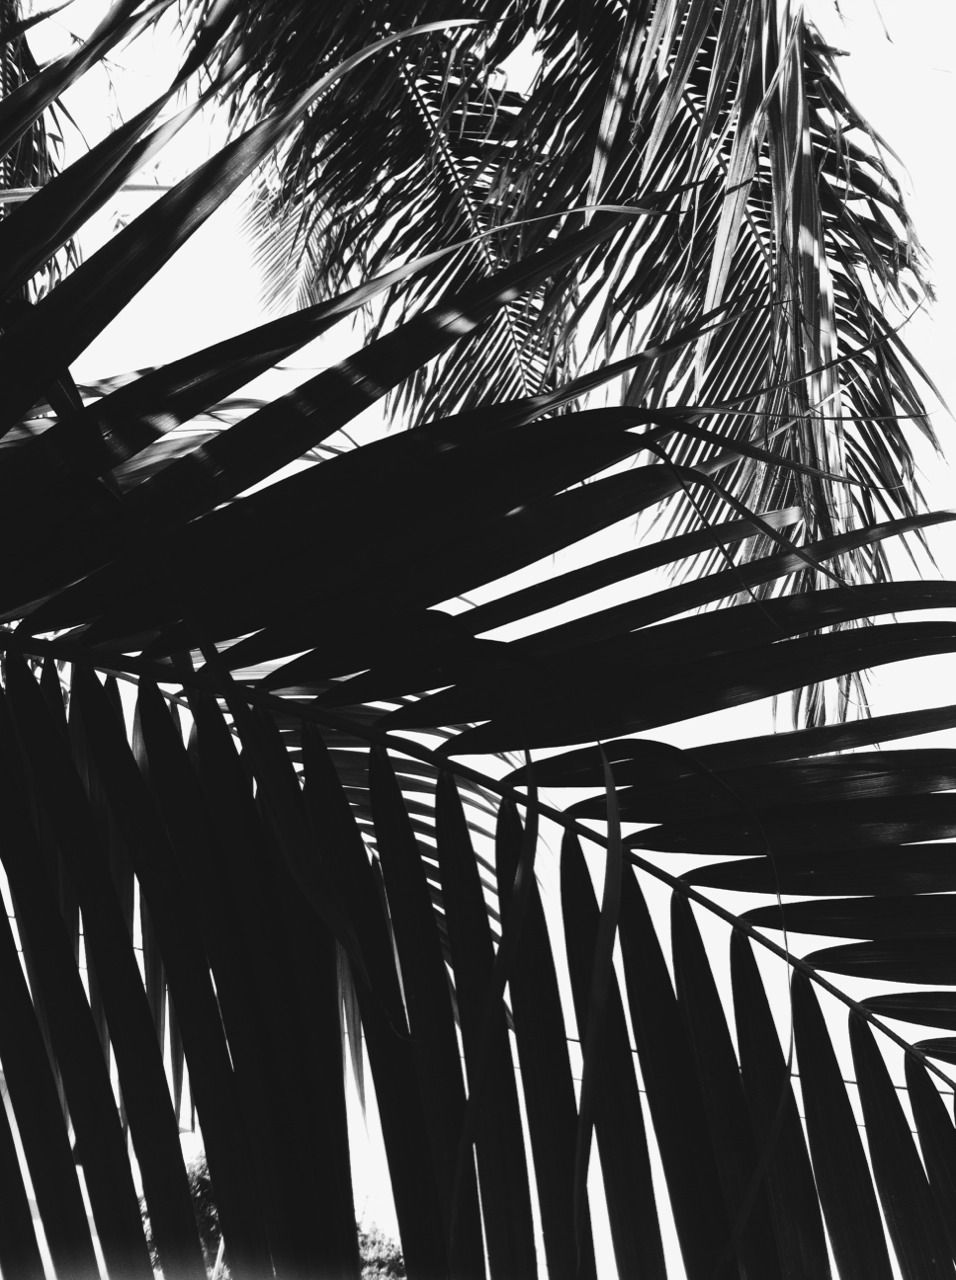 Urbanflavours Pl Tumblr Palm Trees Tumblr Palm Trees